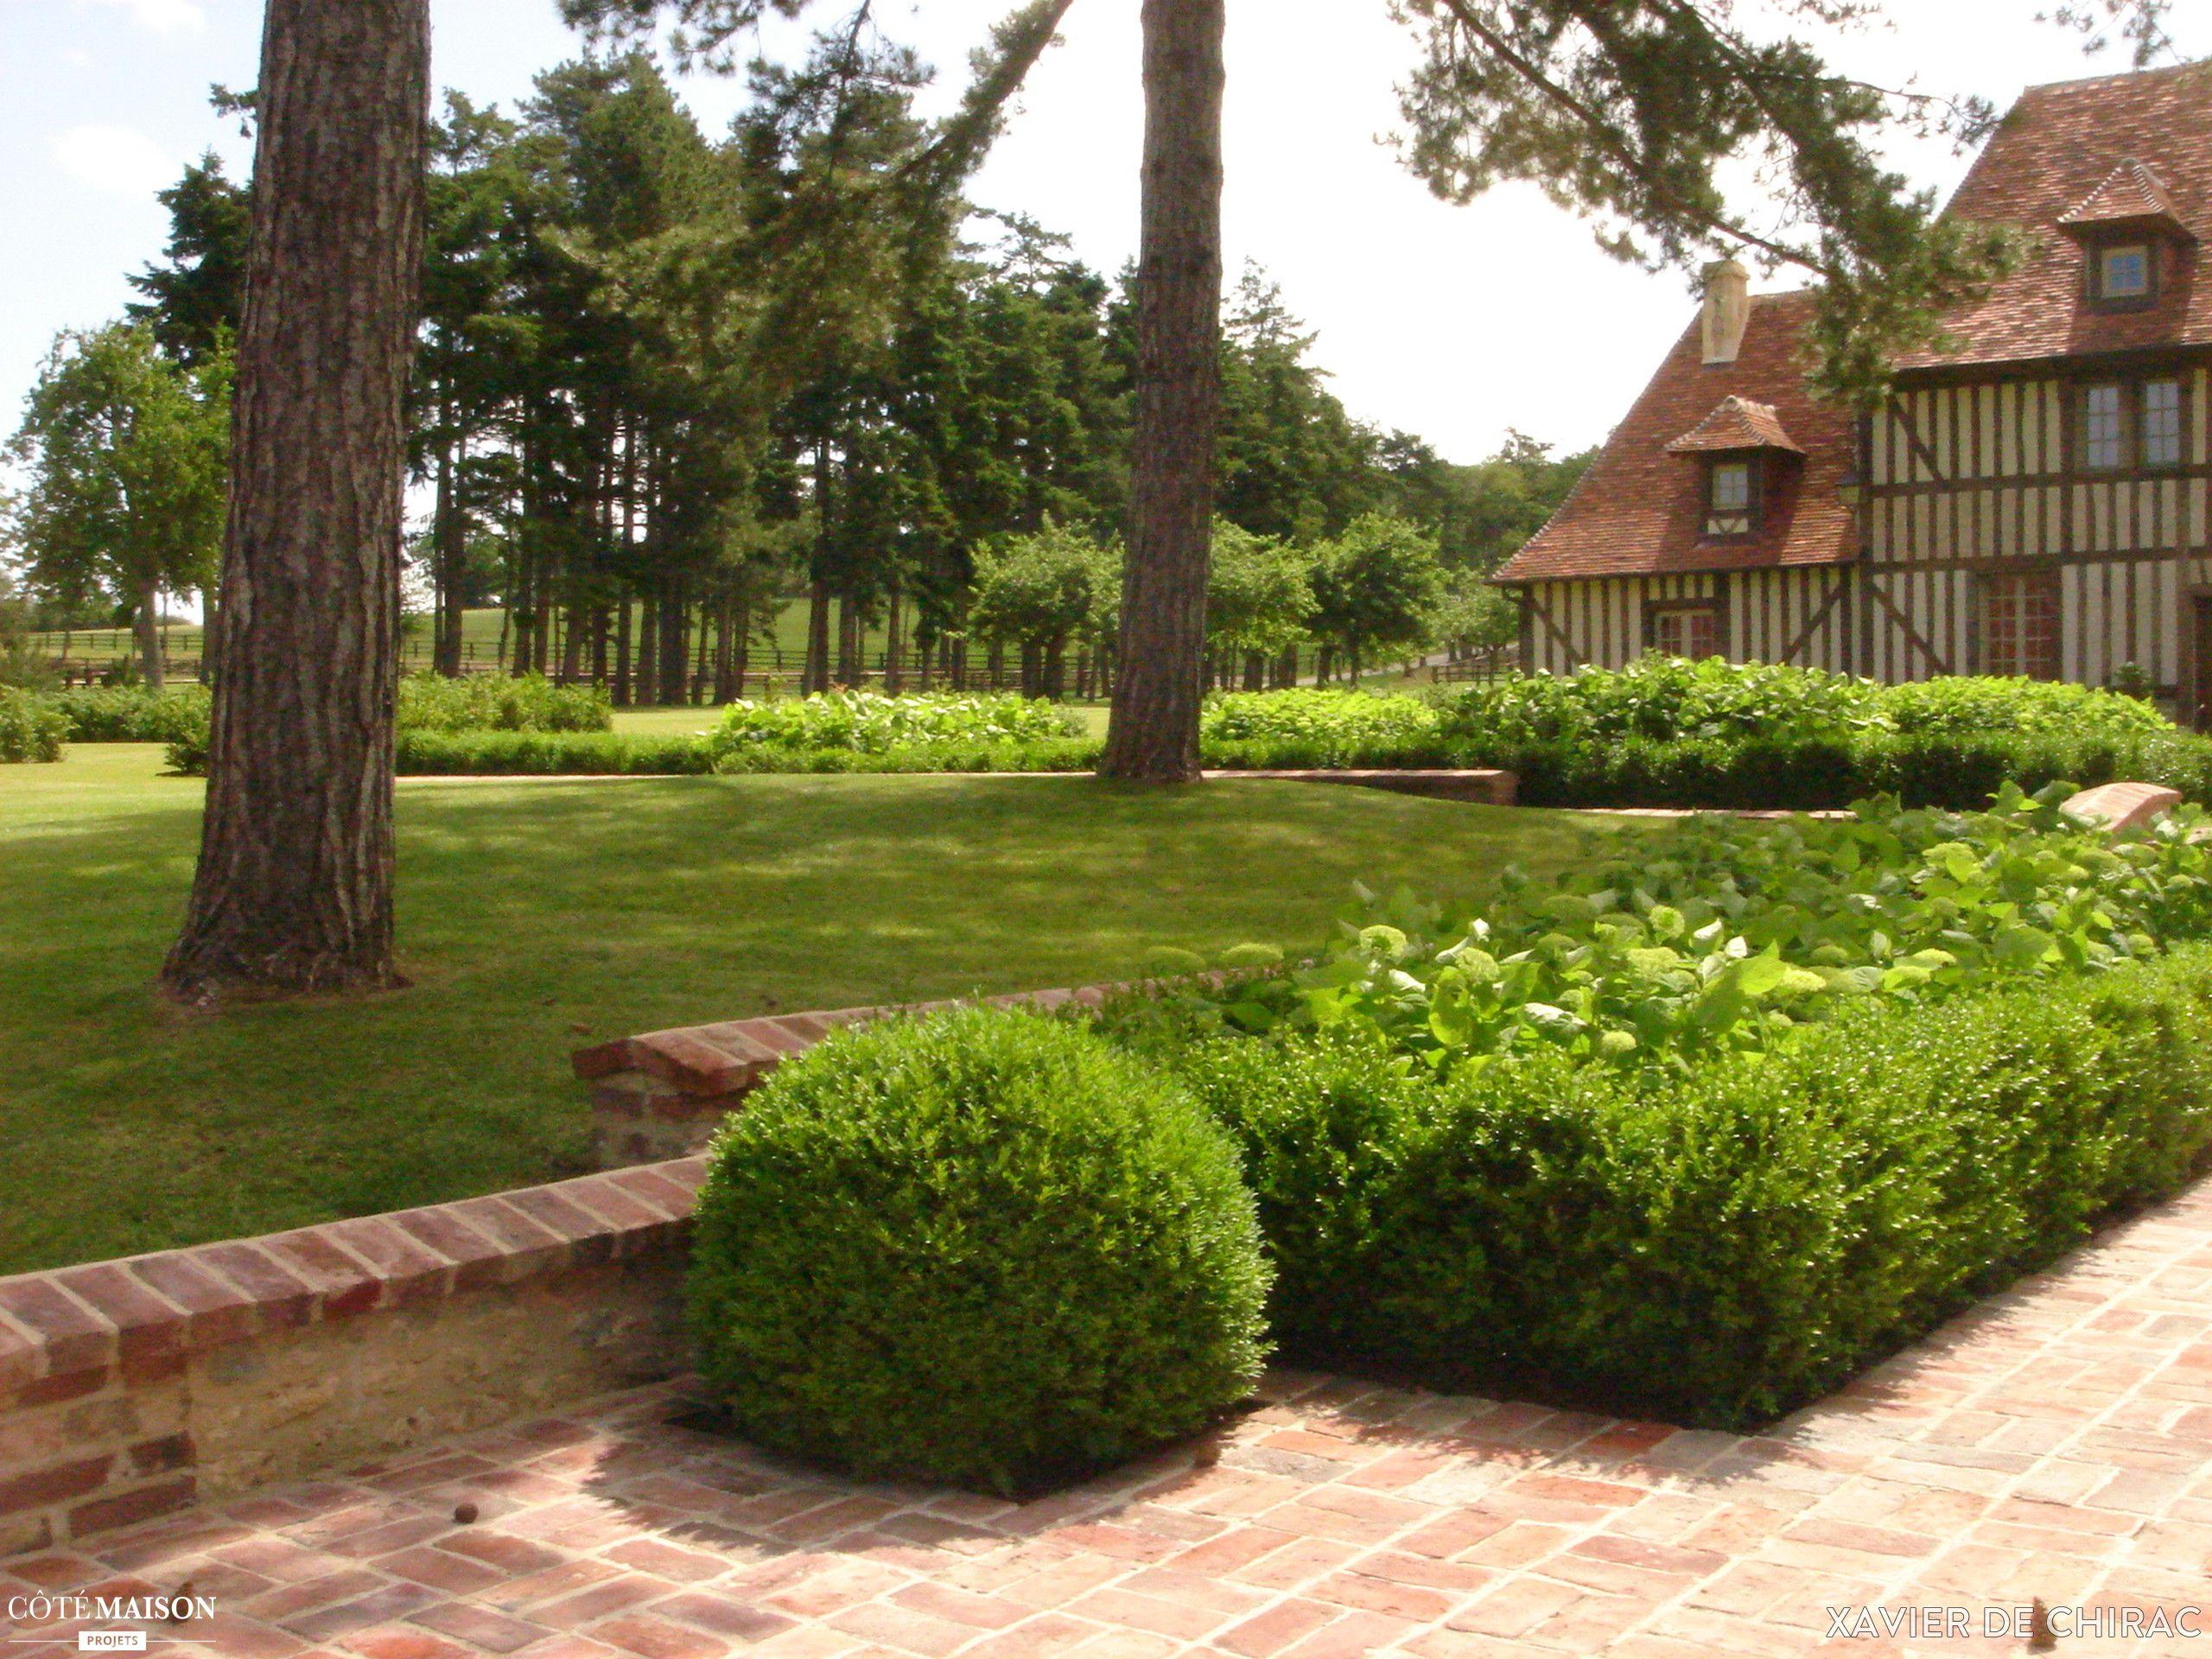 jardin normand dans le bocage des hortensias des buis des rhododendrons du charme et de. Black Bedroom Furniture Sets. Home Design Ideas